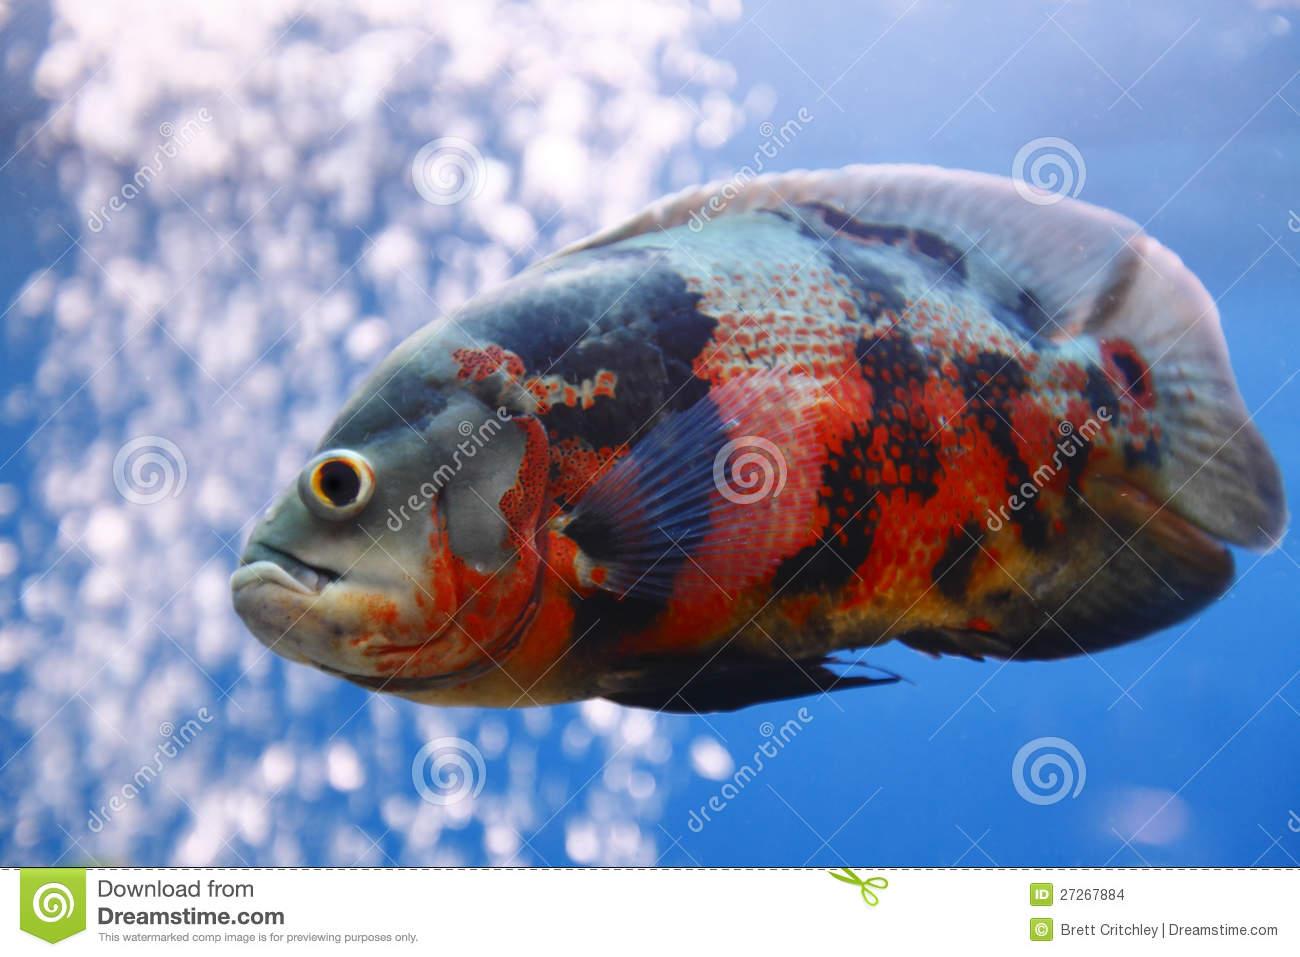 Oscar (Fish) clipart #7, Download drawings